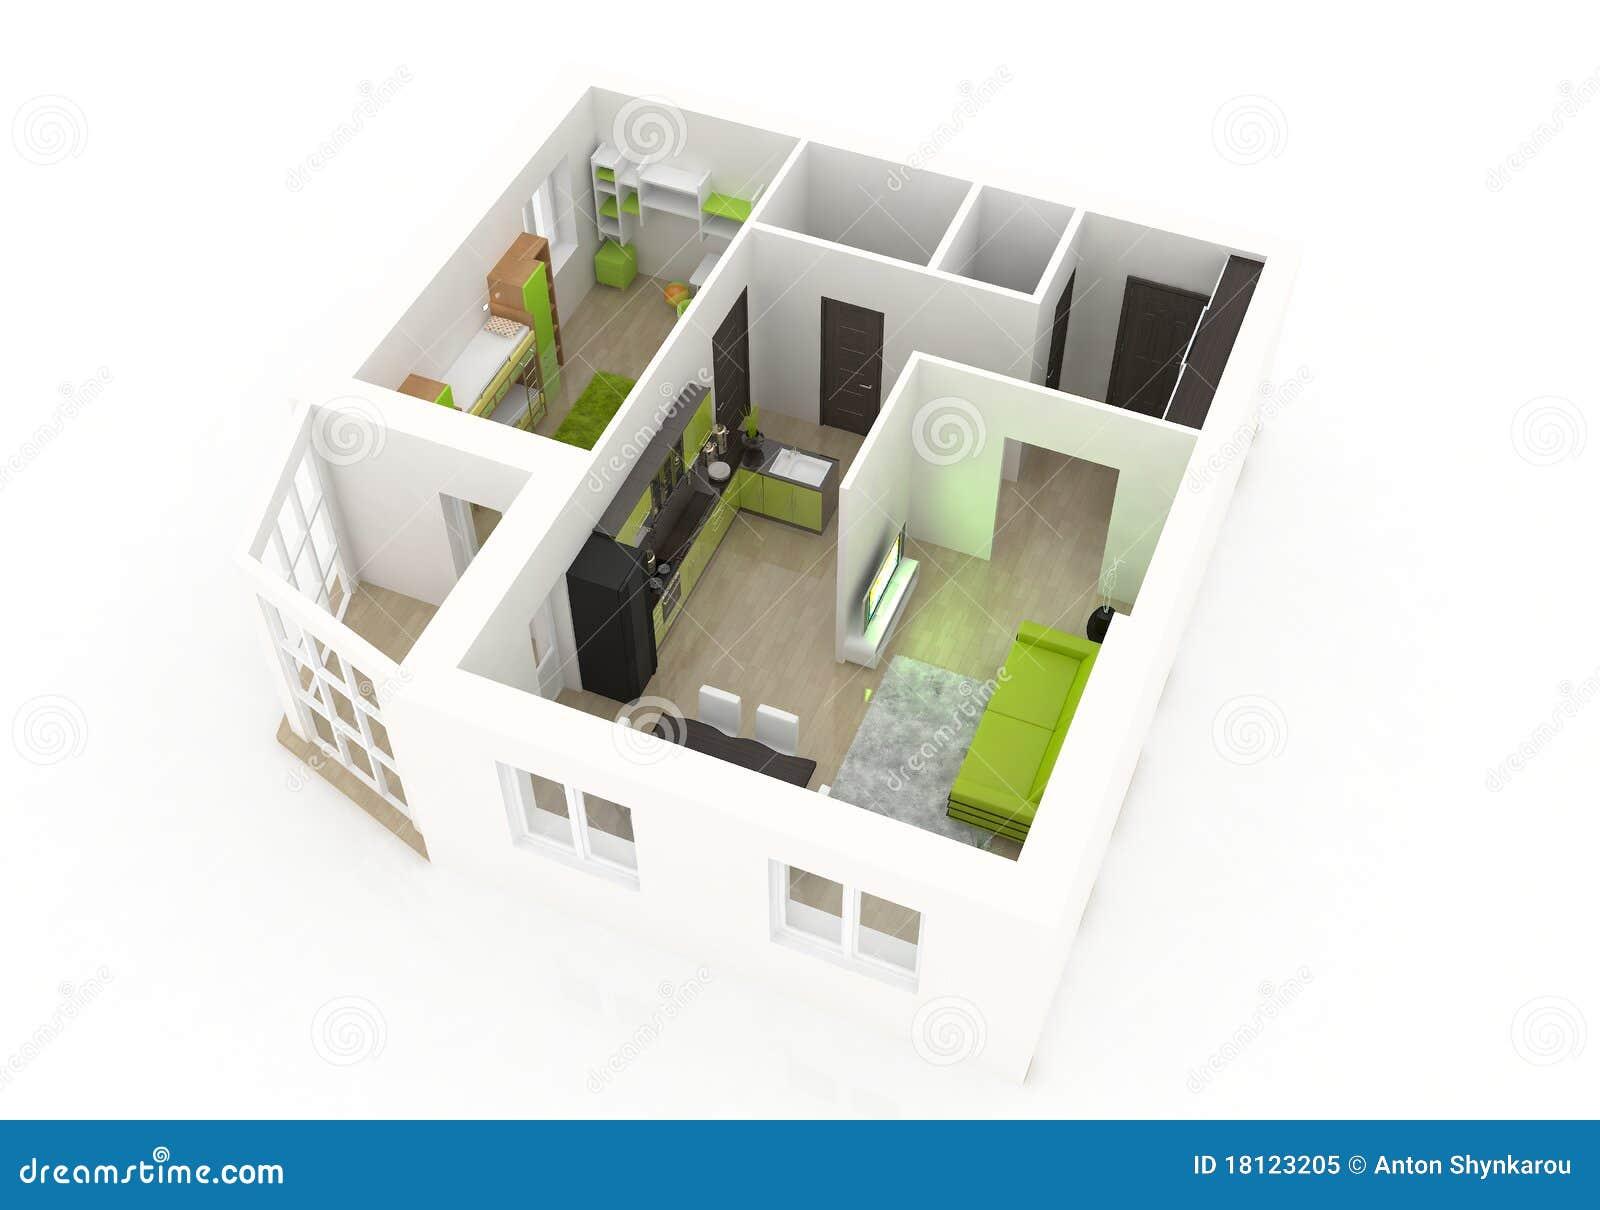 3d interior design royalty free stock photo - image: 18123205, Innenarchitektur ideen